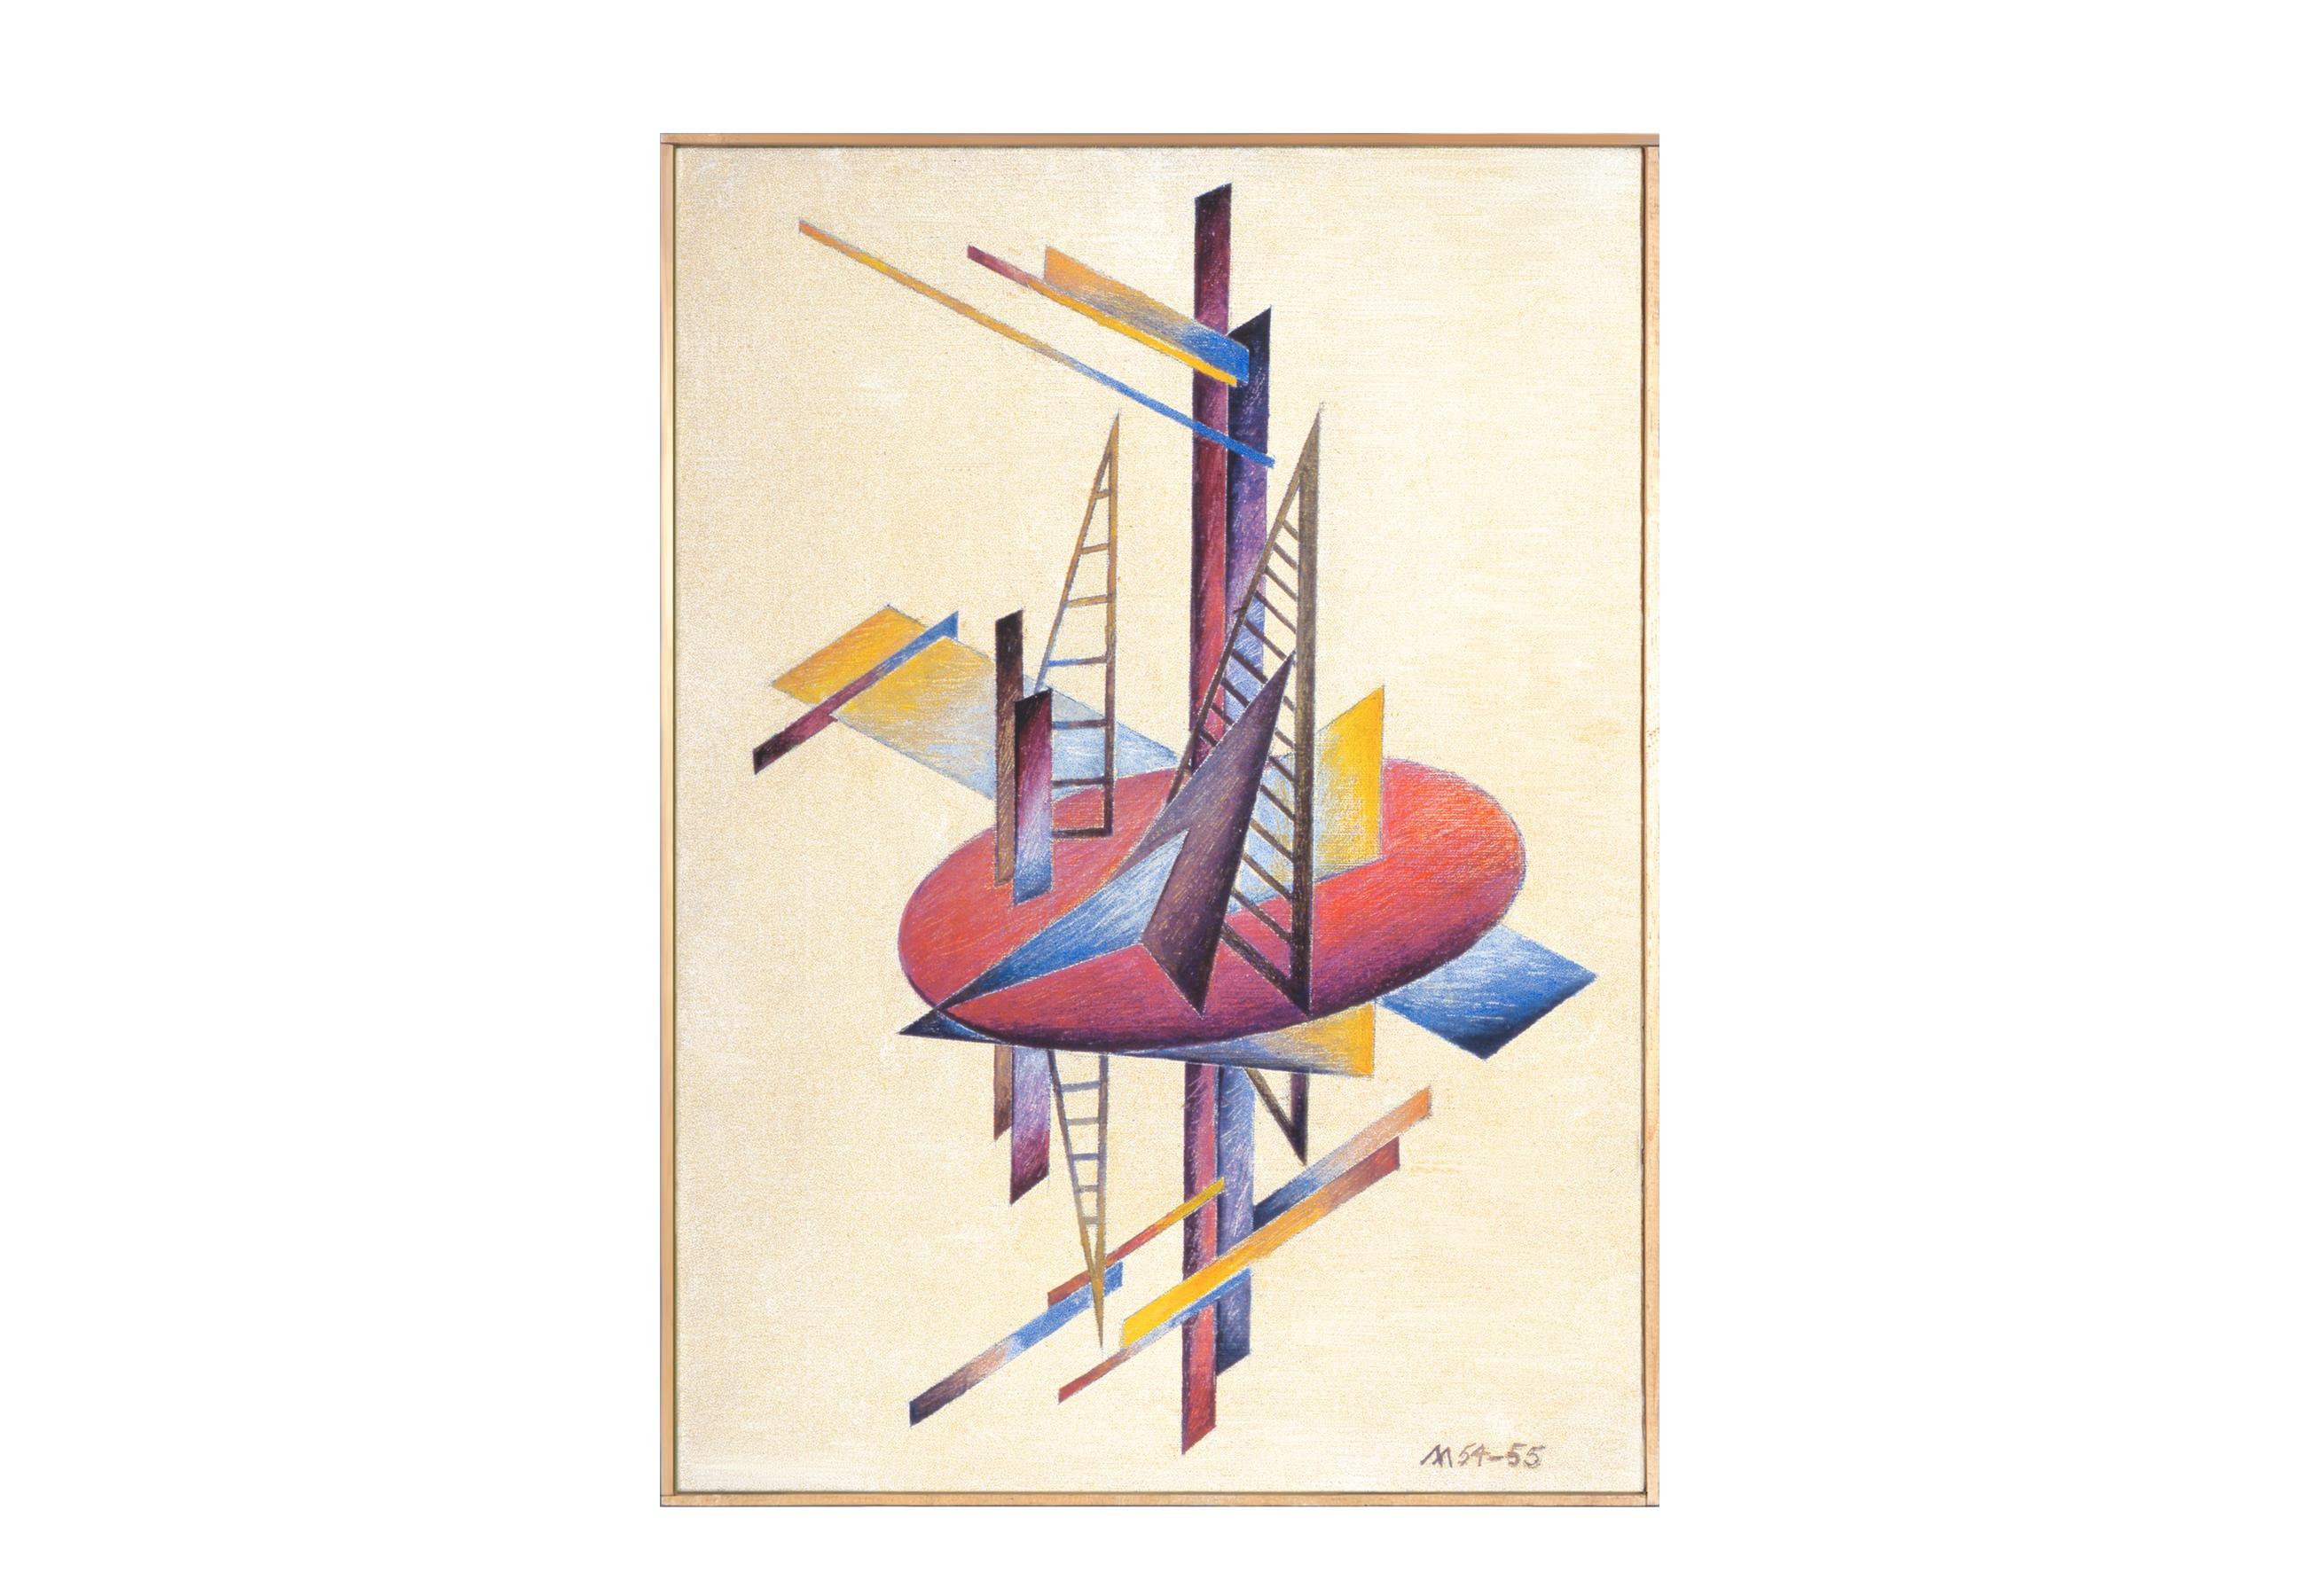 Lamm-Portfolio-1954-1955-17.jpg